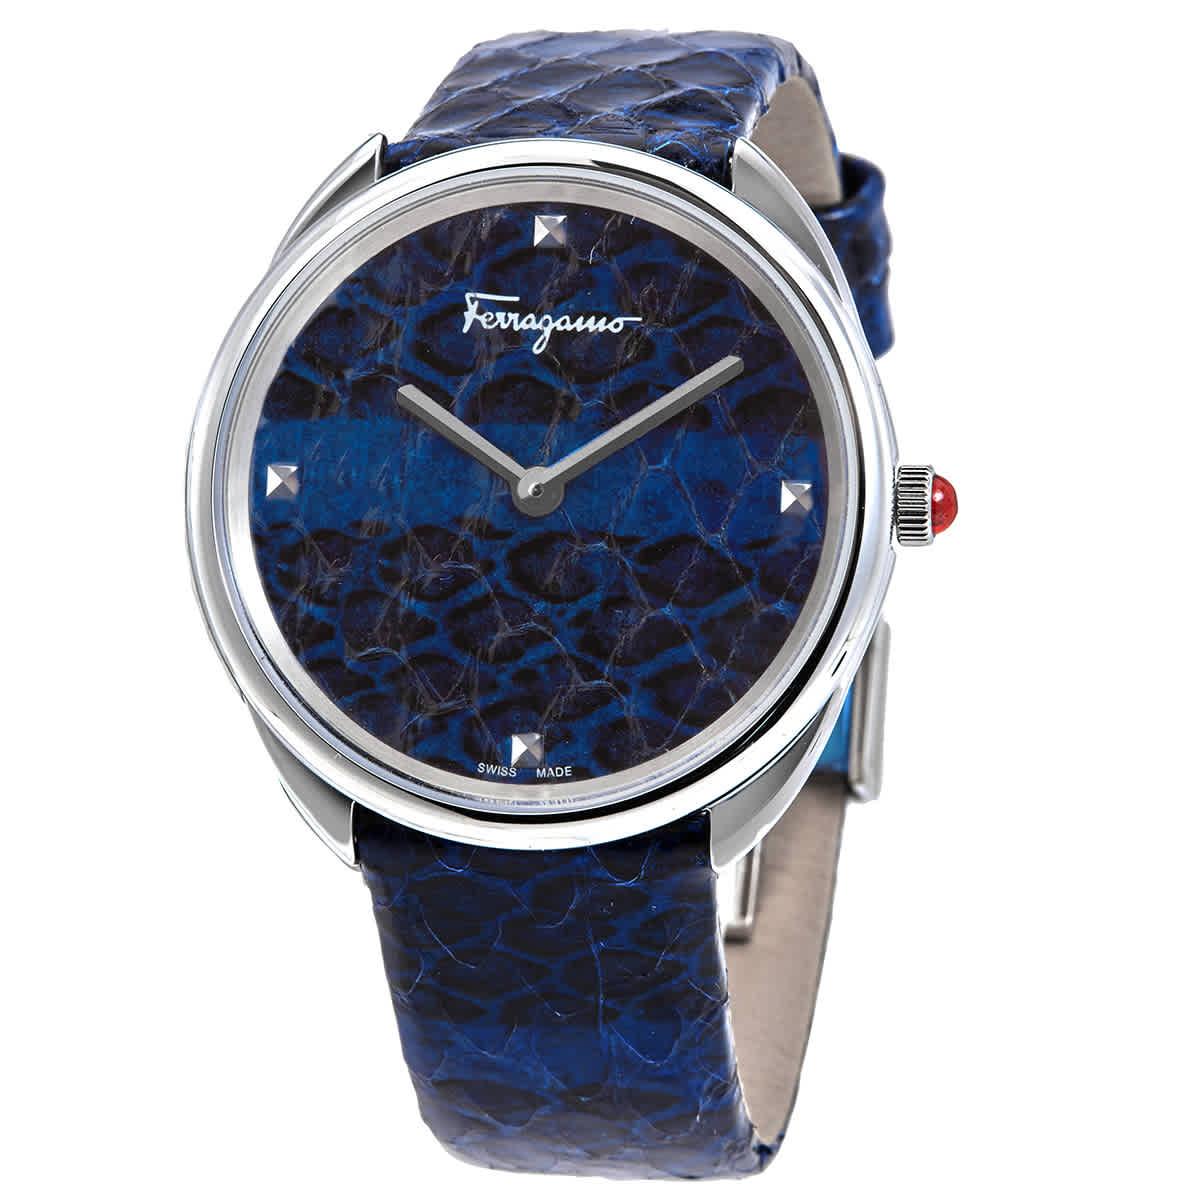 Salvatore Ferragamo Ferragamo Cuir Quartz Blue Dial Ladies Watch Sfay00119 In Blue,silver Tone